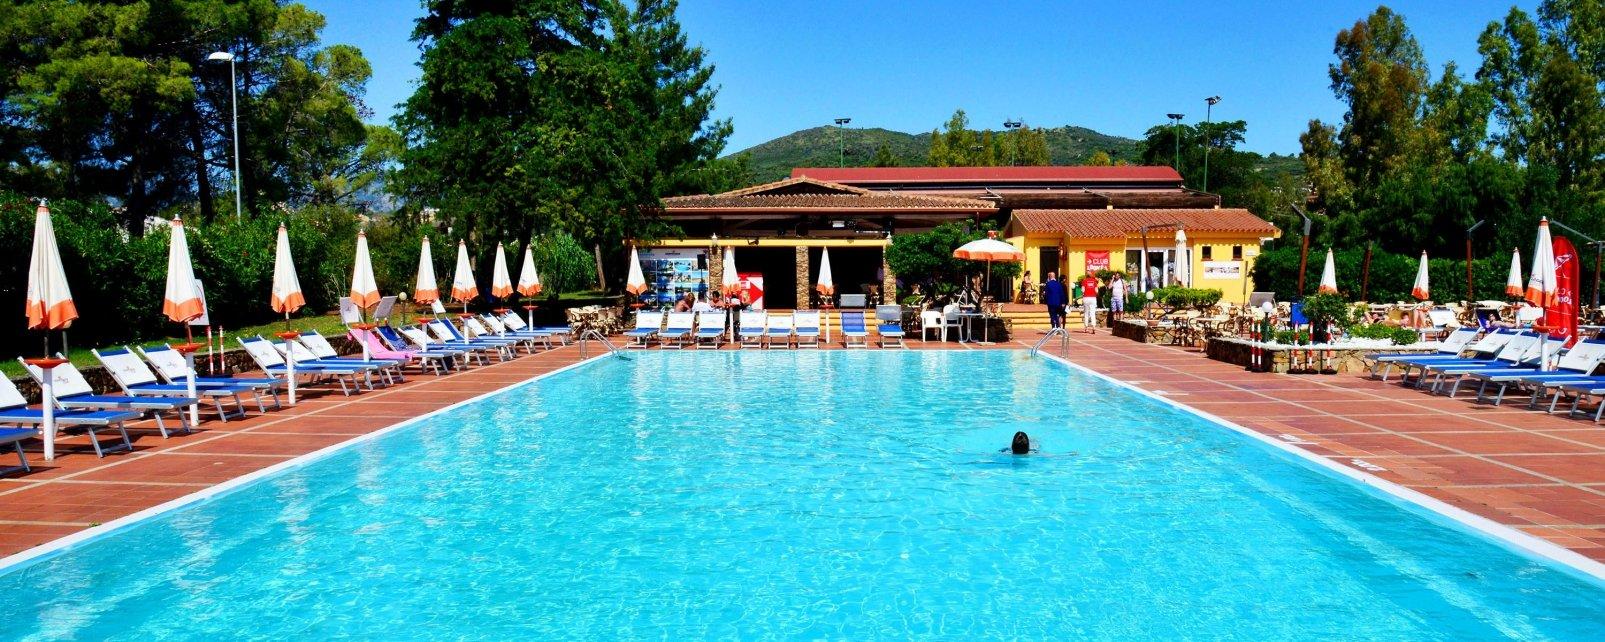 Hotel agrustos village budoni sardegna italia for Hotel sardegna budoni